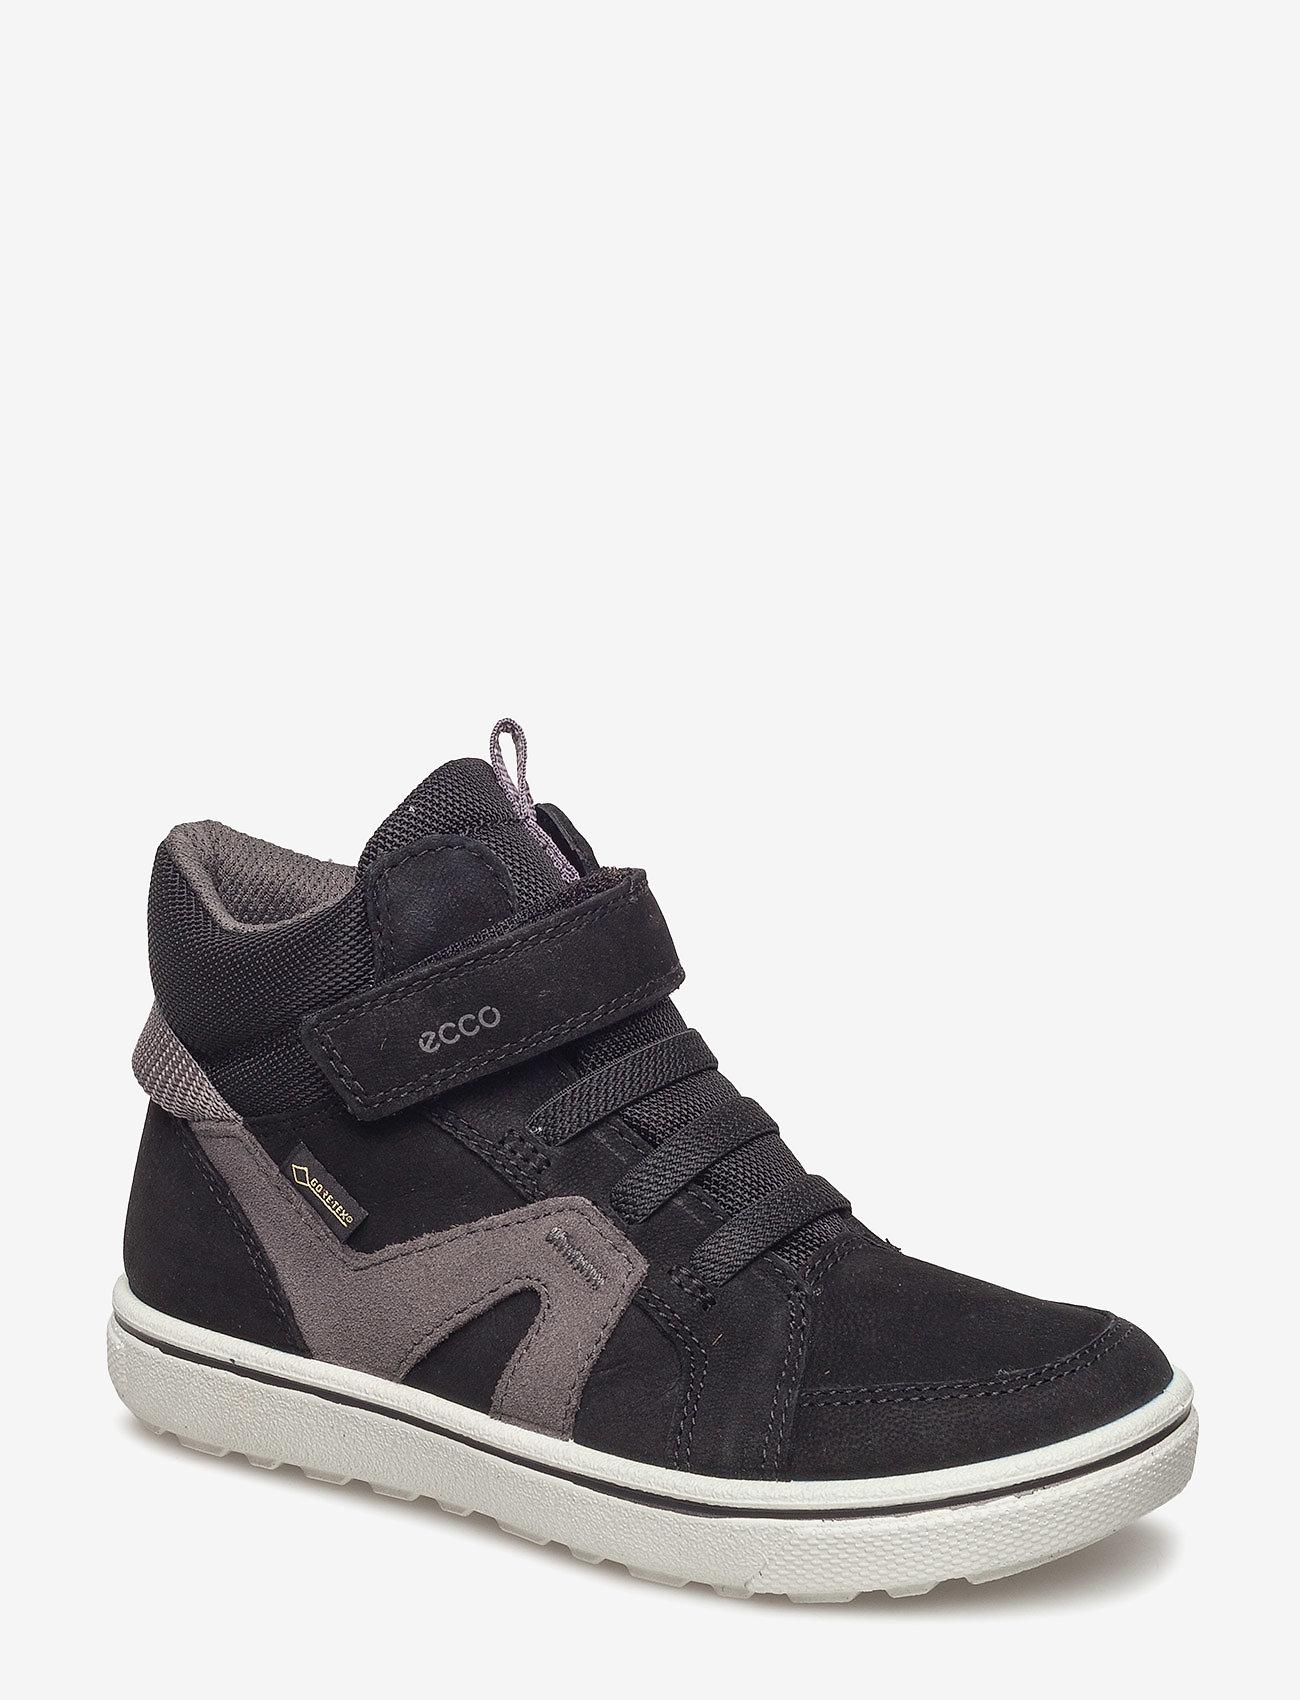 ECCO - GLYDER - tennarit - black/slate